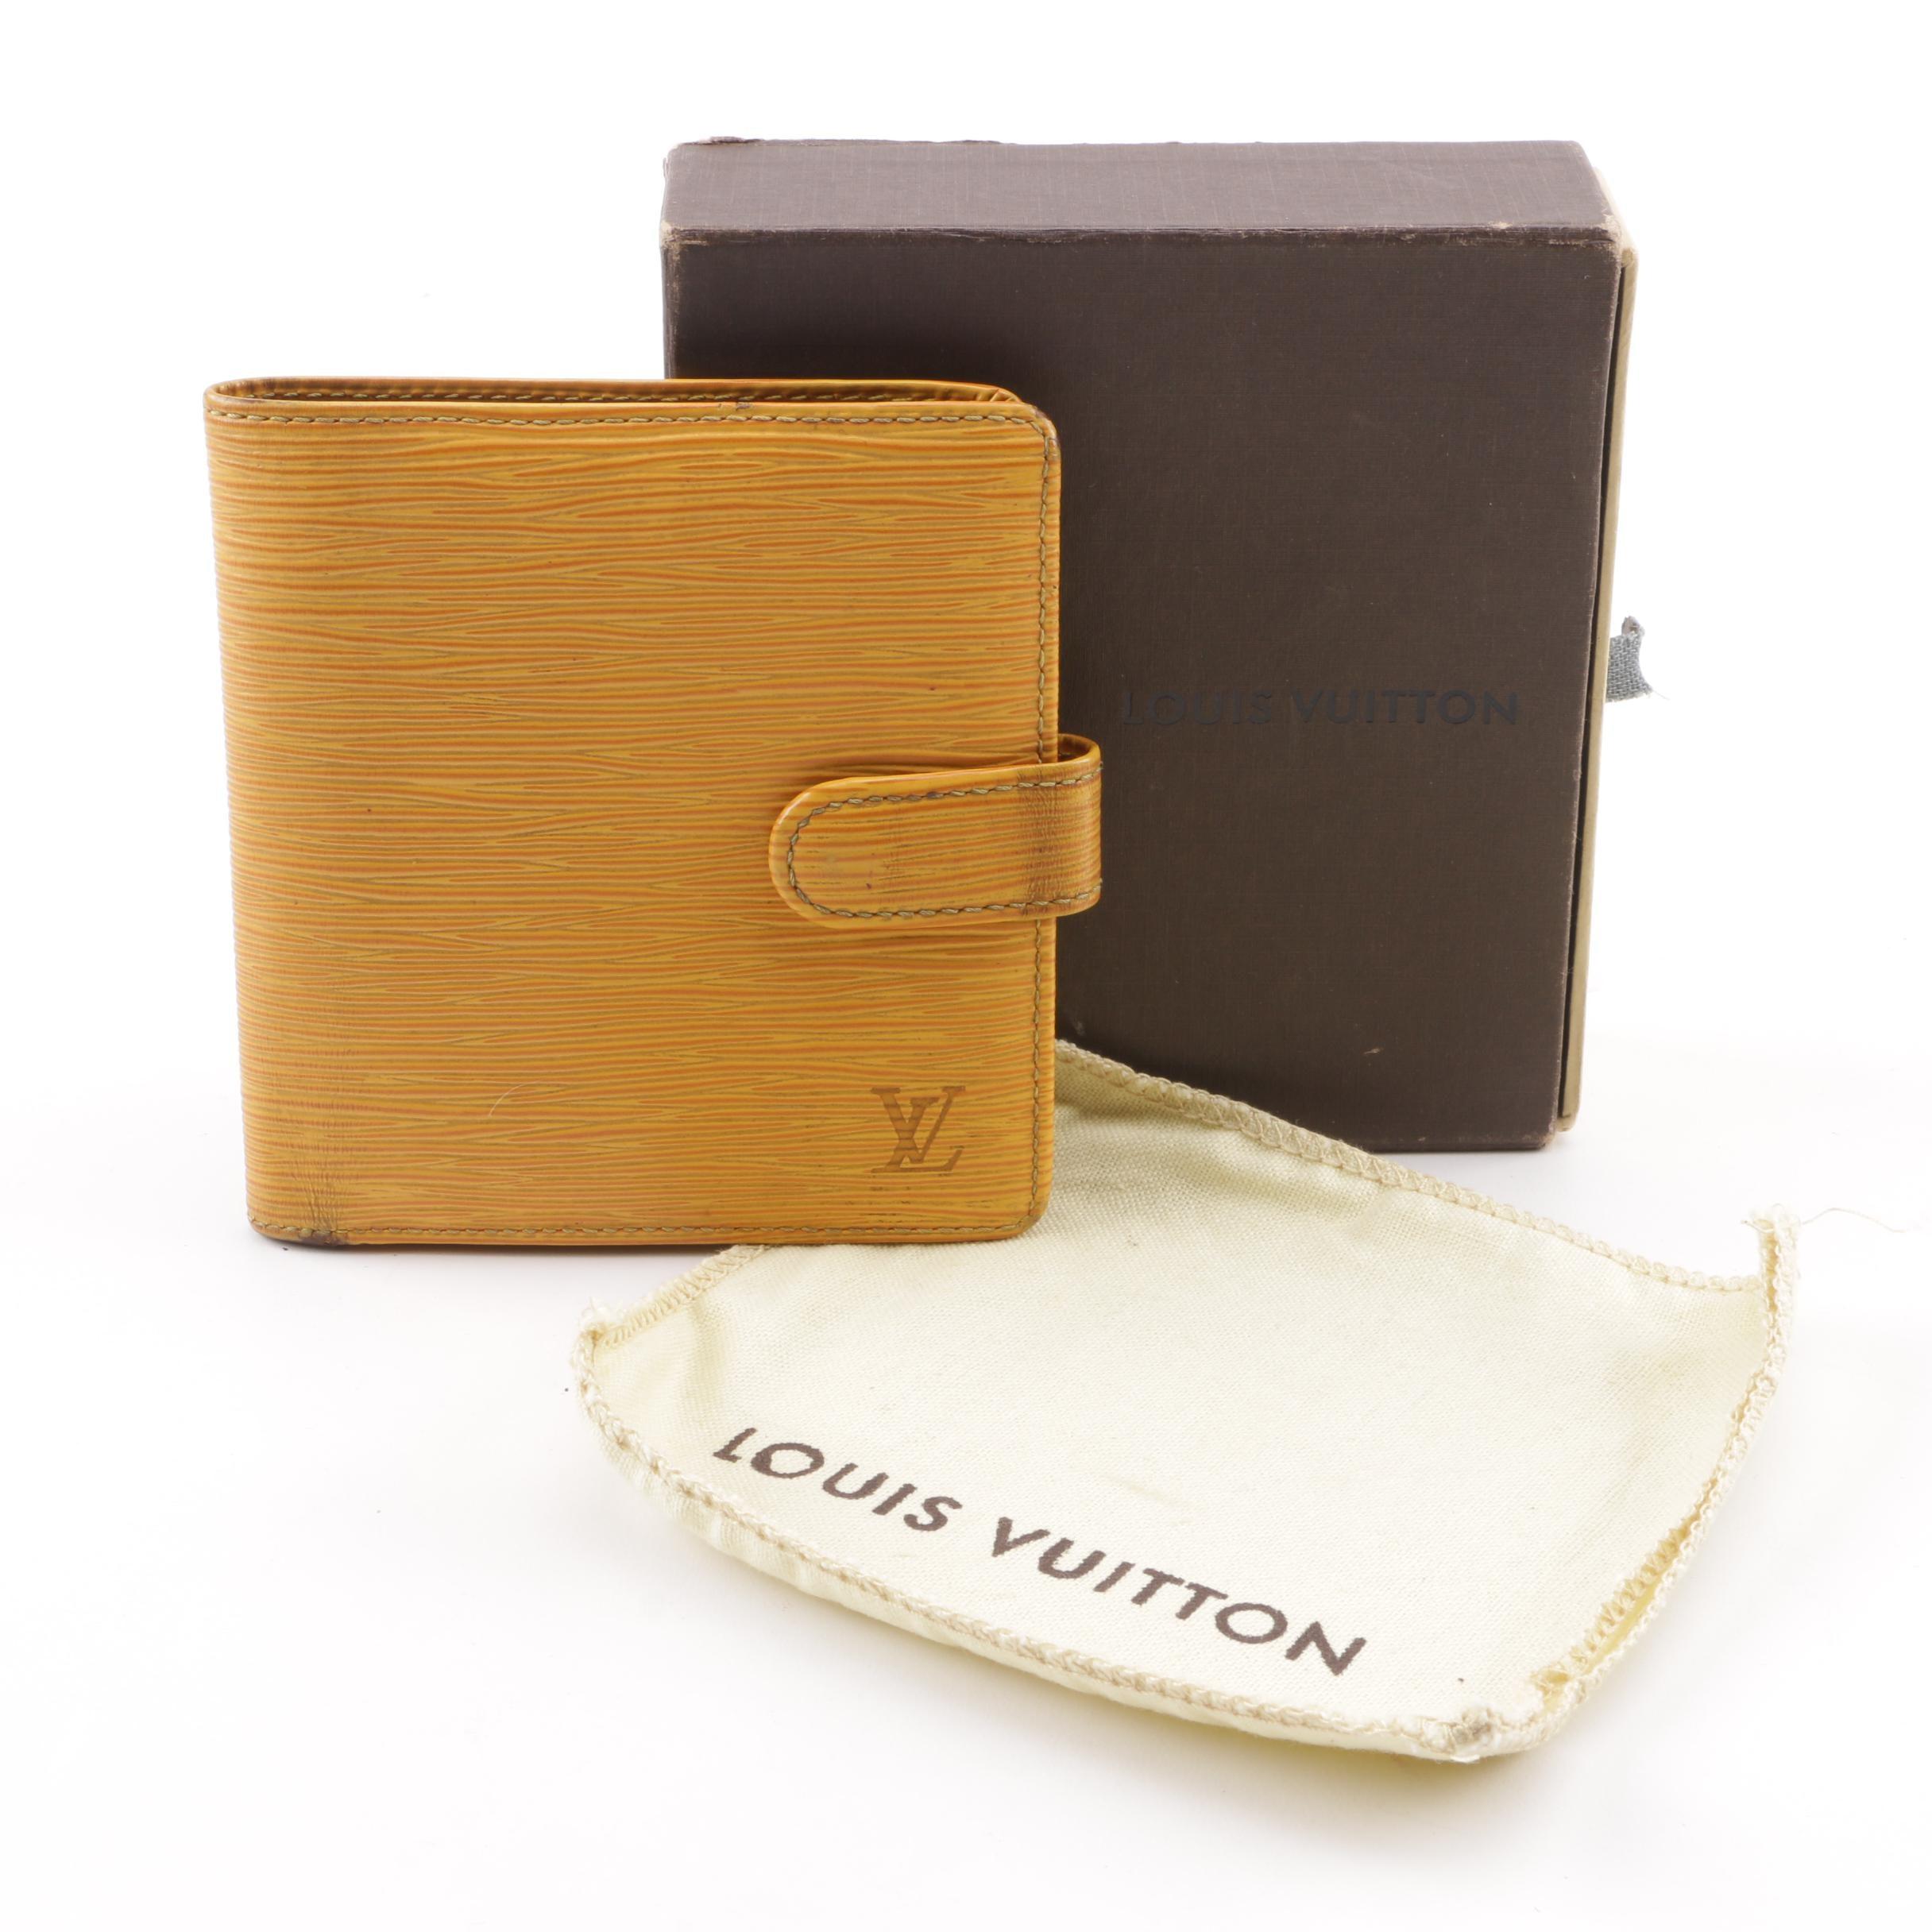 1999 Louis Vuitton Tassil Yellow Epi Leather Wallet with Box